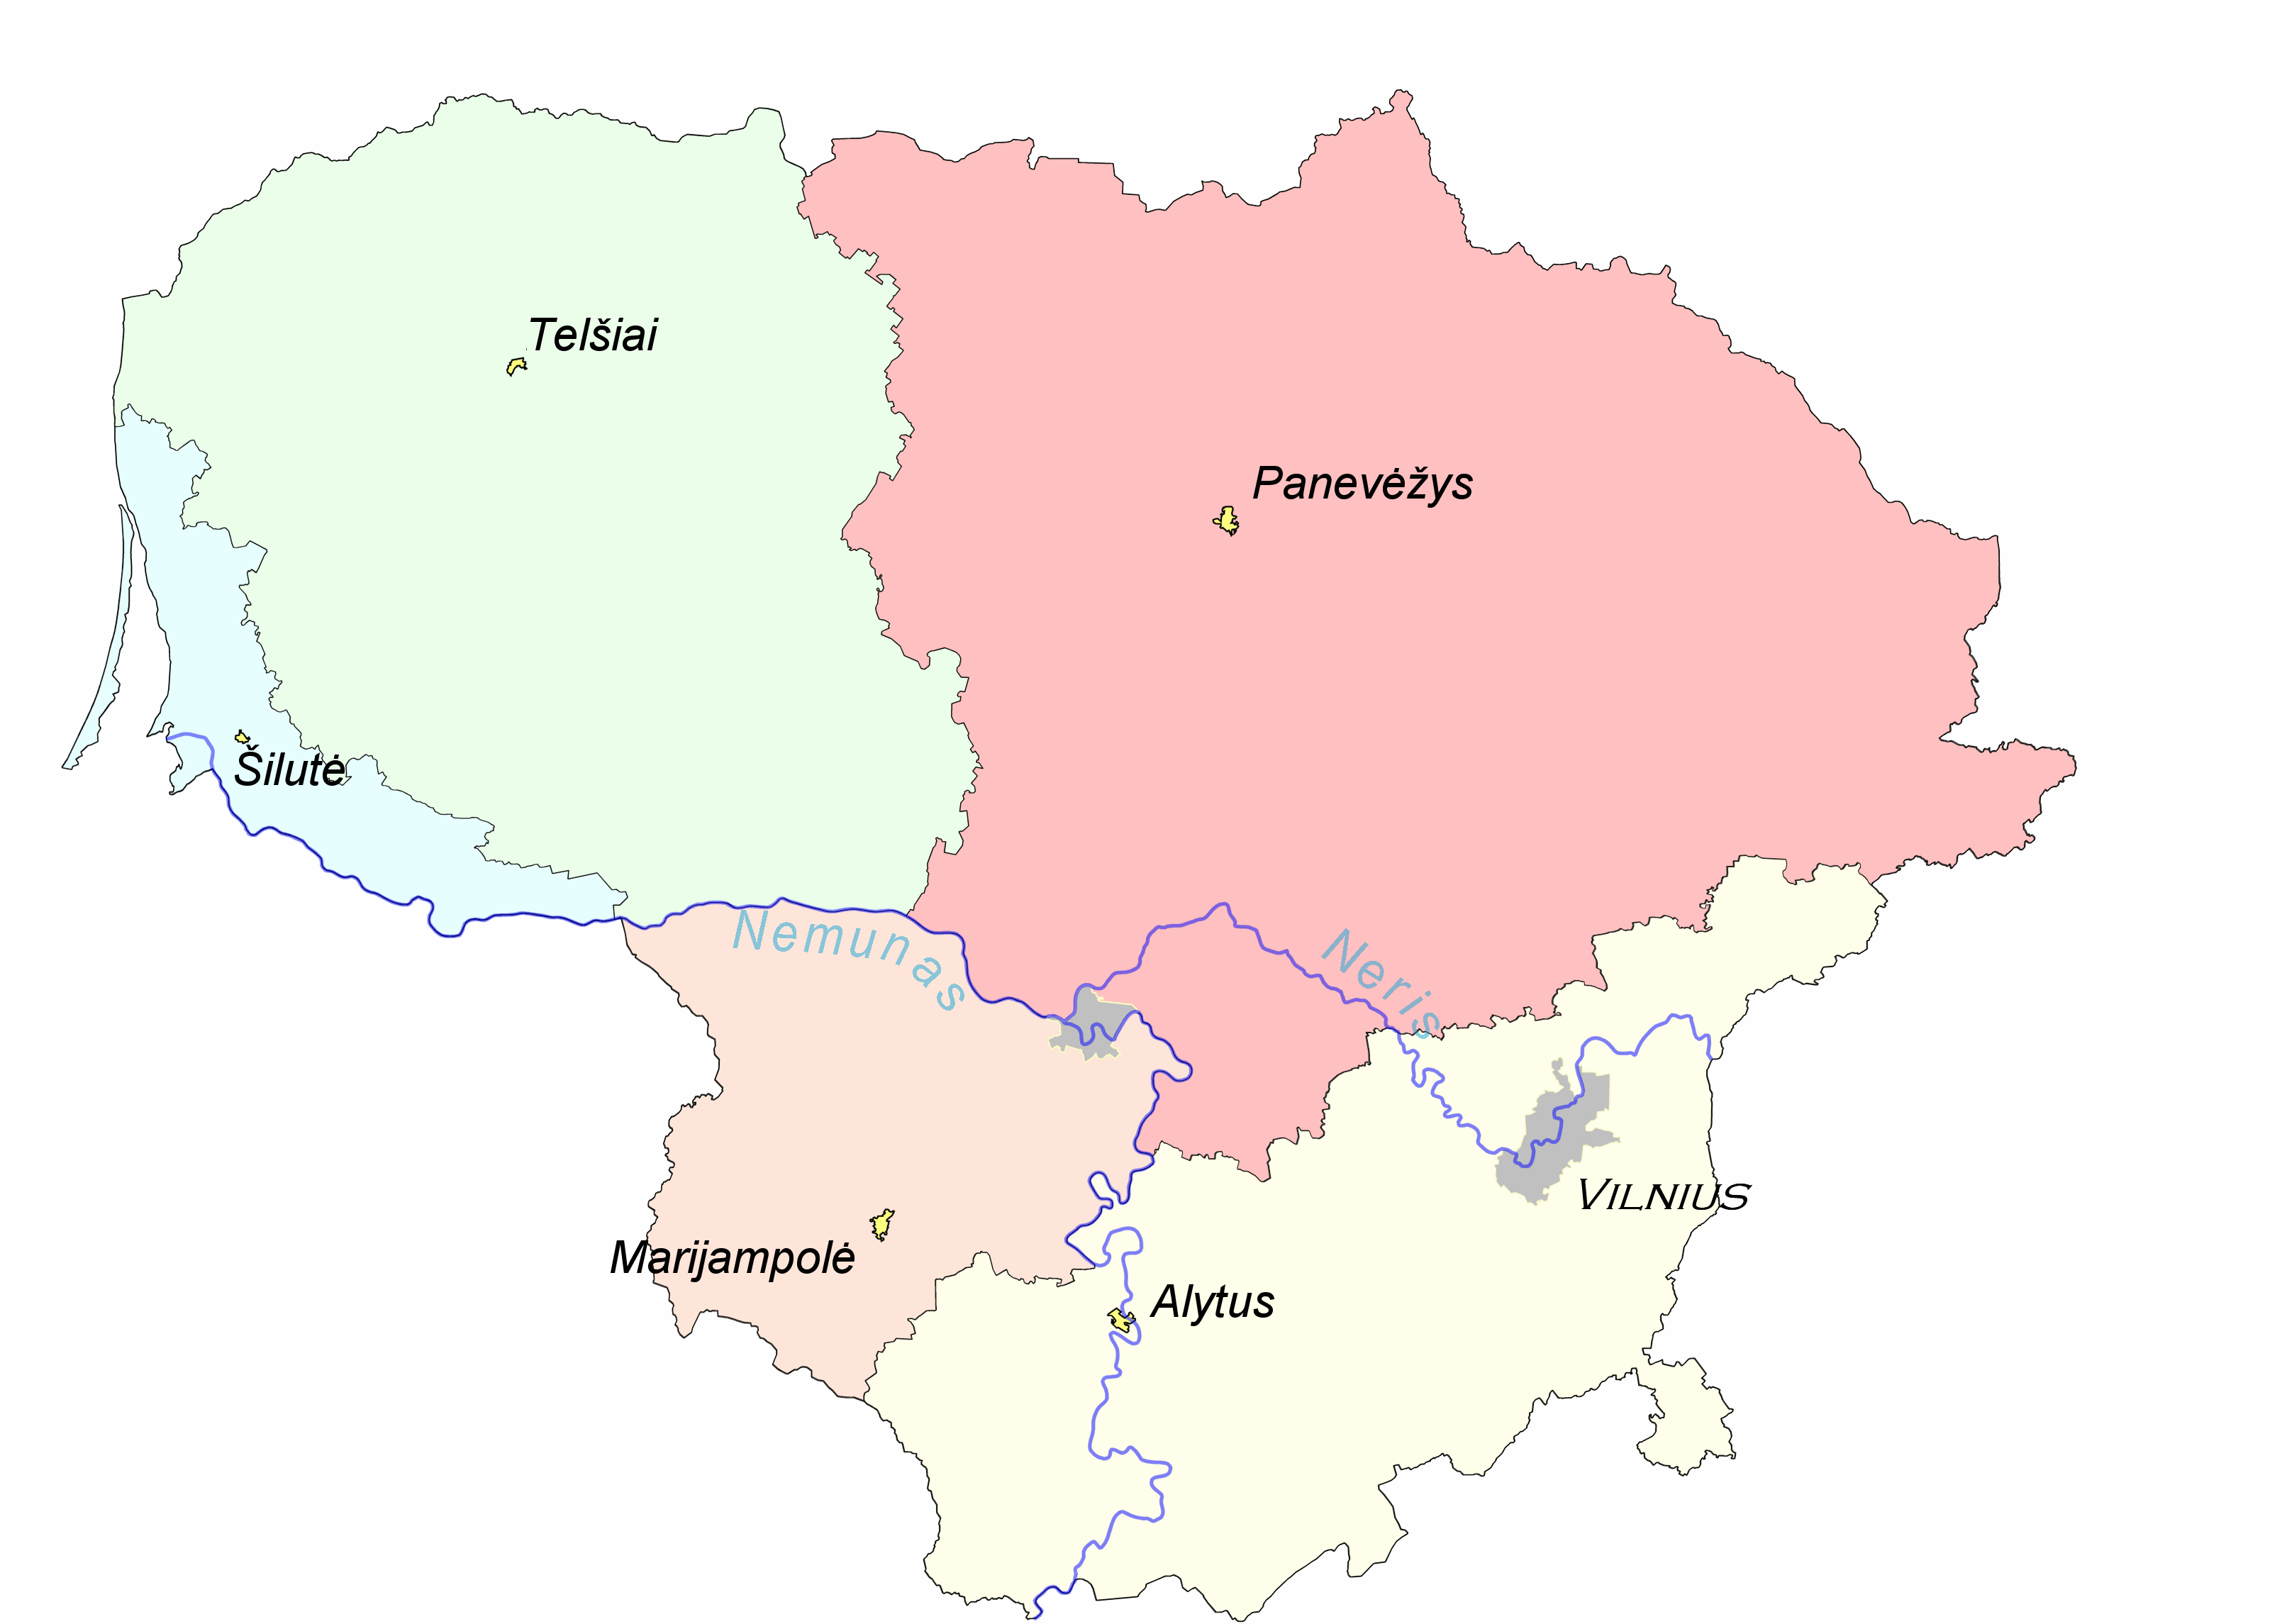 Liet etno regionaipng Ethnographic map Atlas of Lithuania